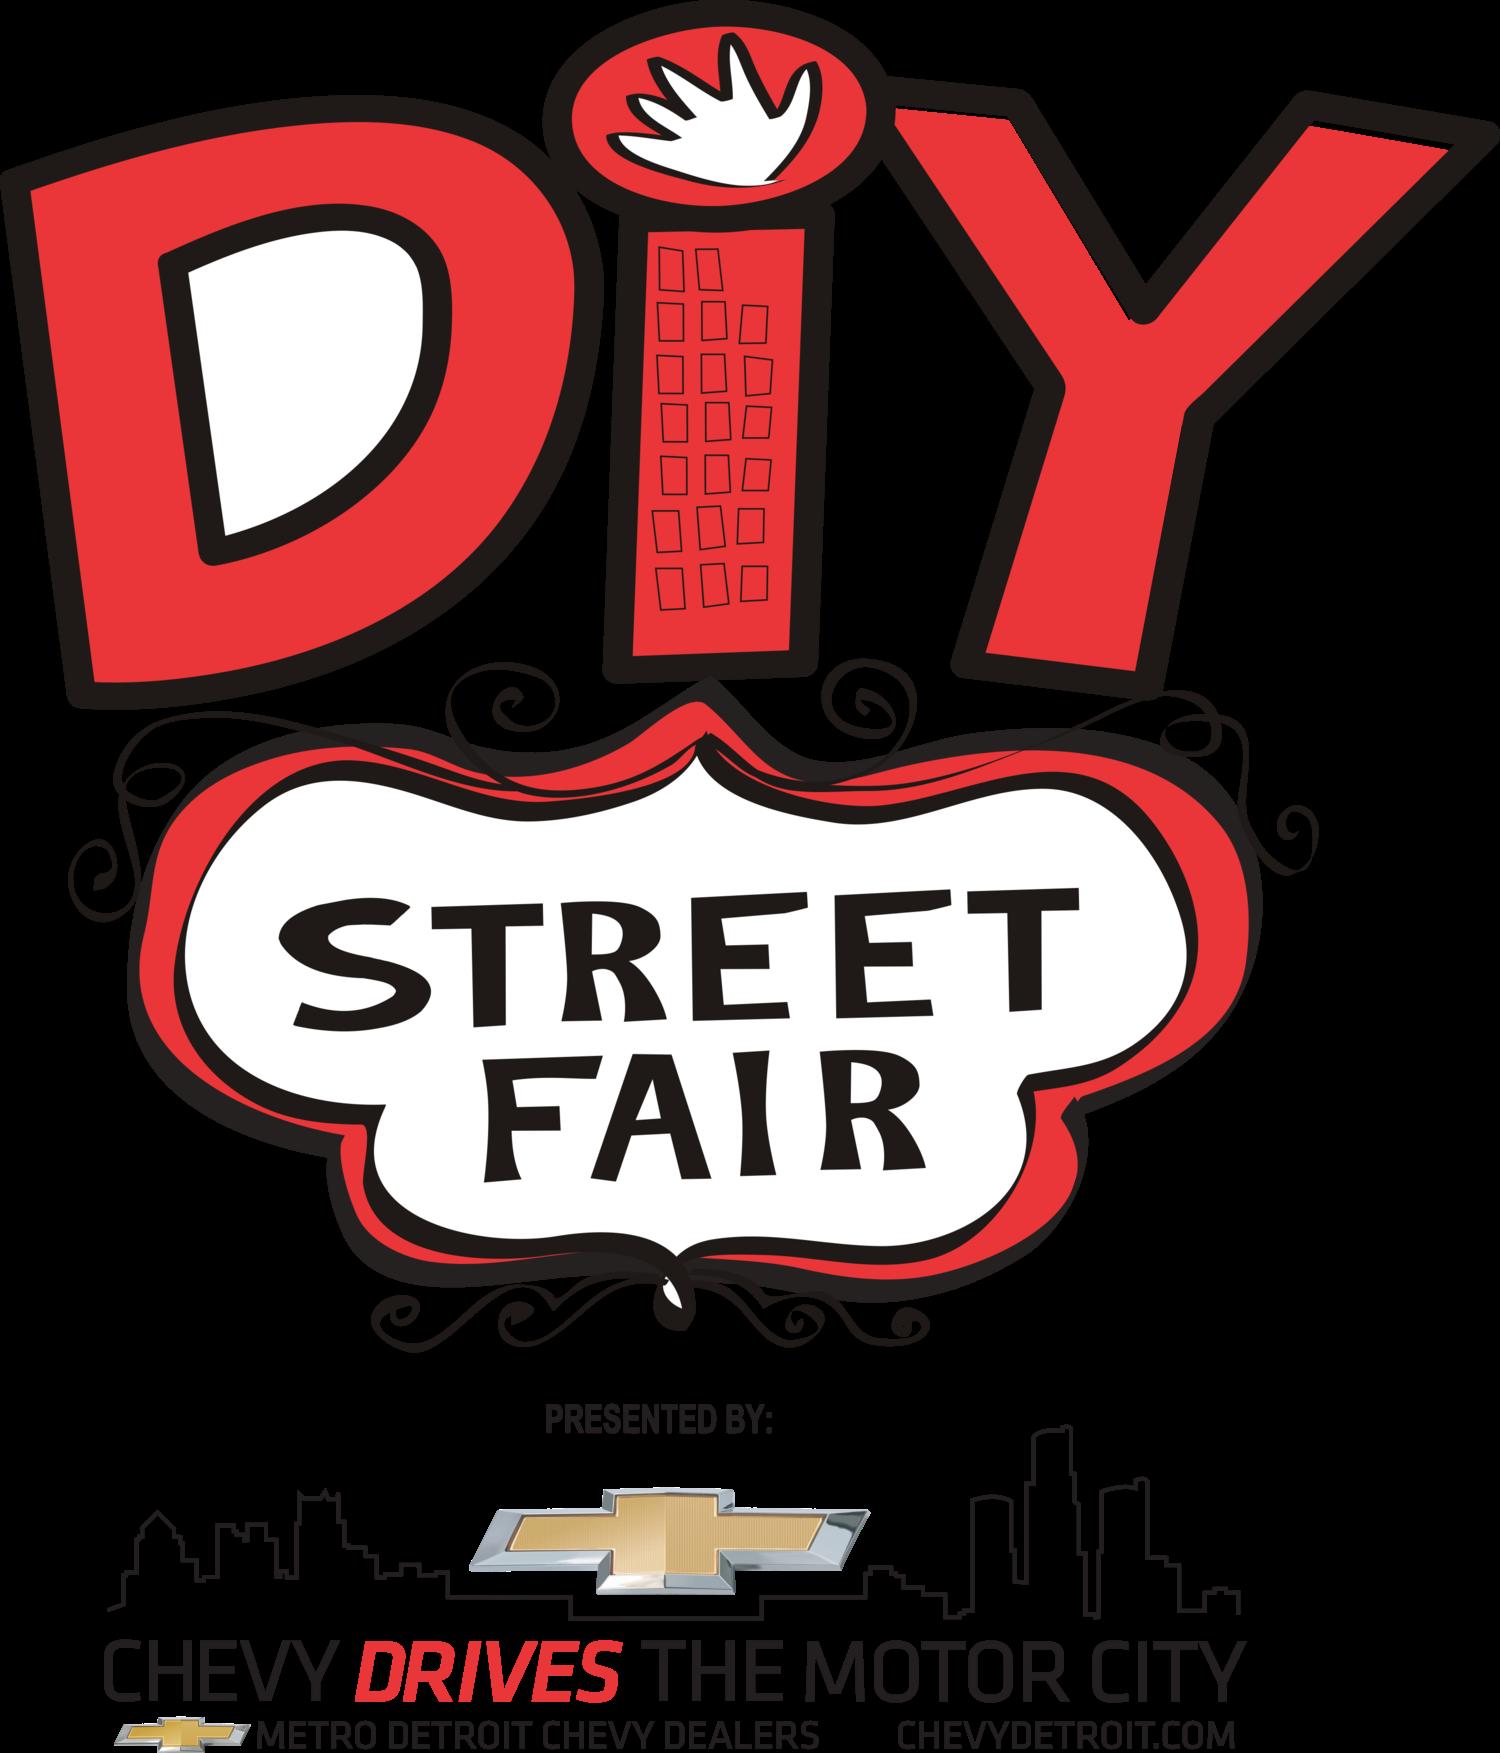 DIY STREET FAIR